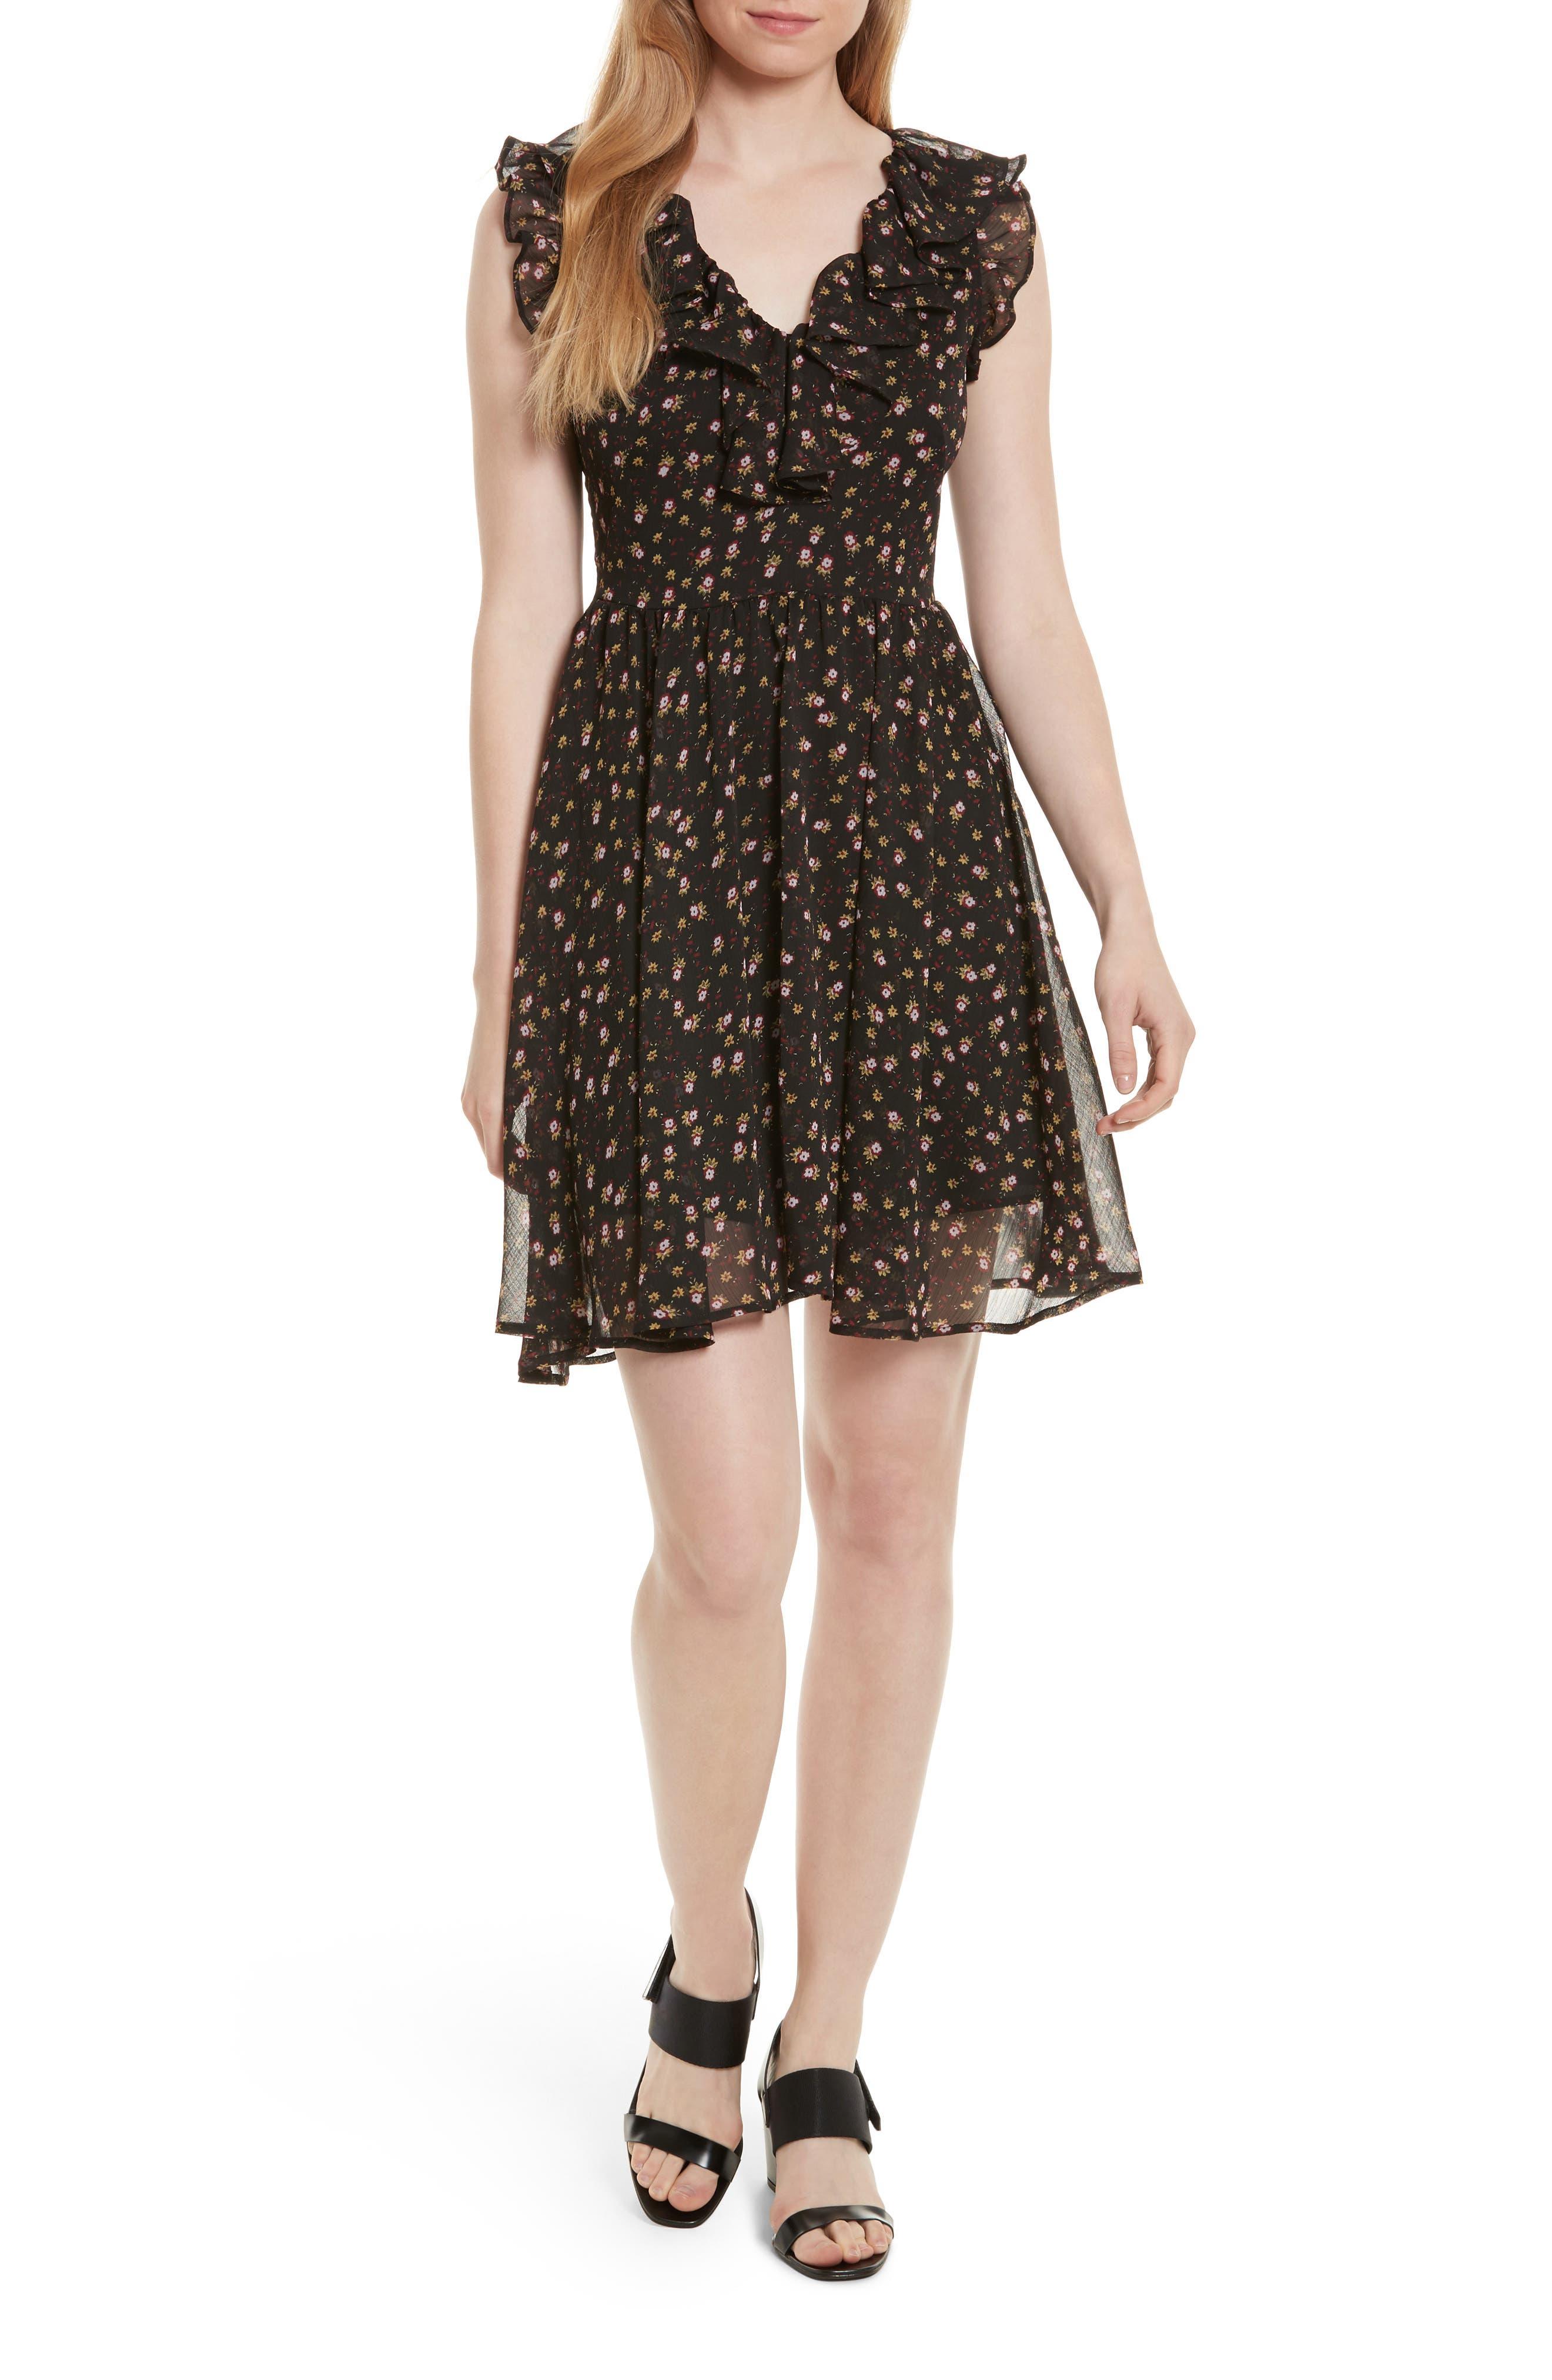 Main Image - Rebecca Minkoff Brista Fit & Flare Dress